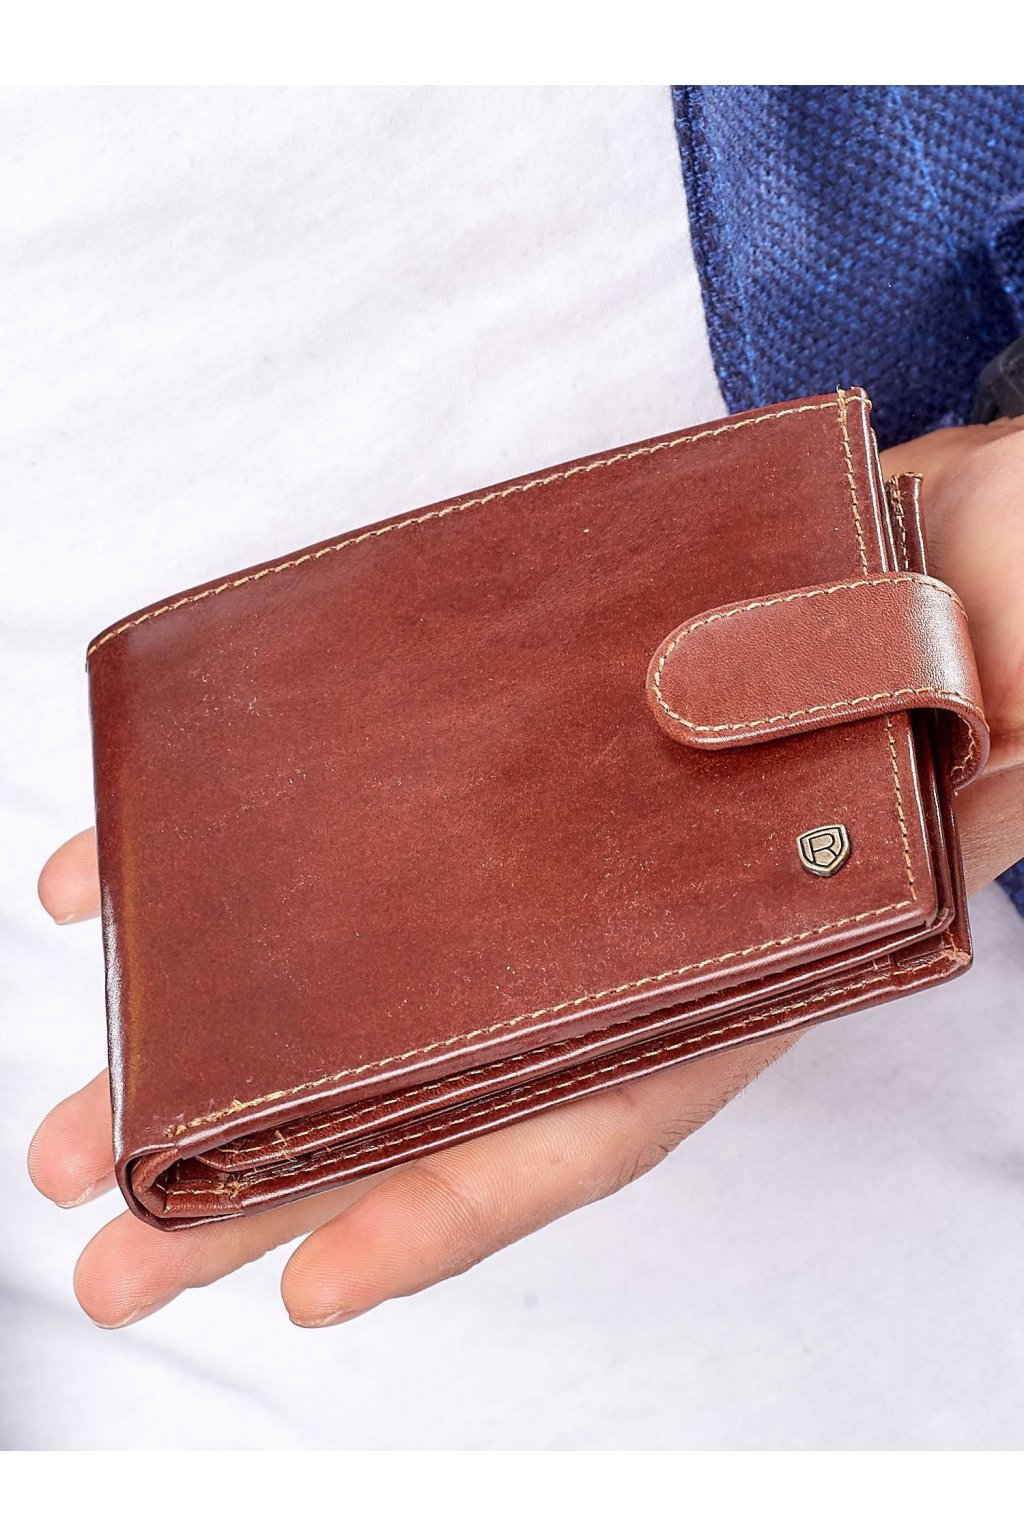 Pánska peňaženka kód CE-PR-N01L-RVT.41